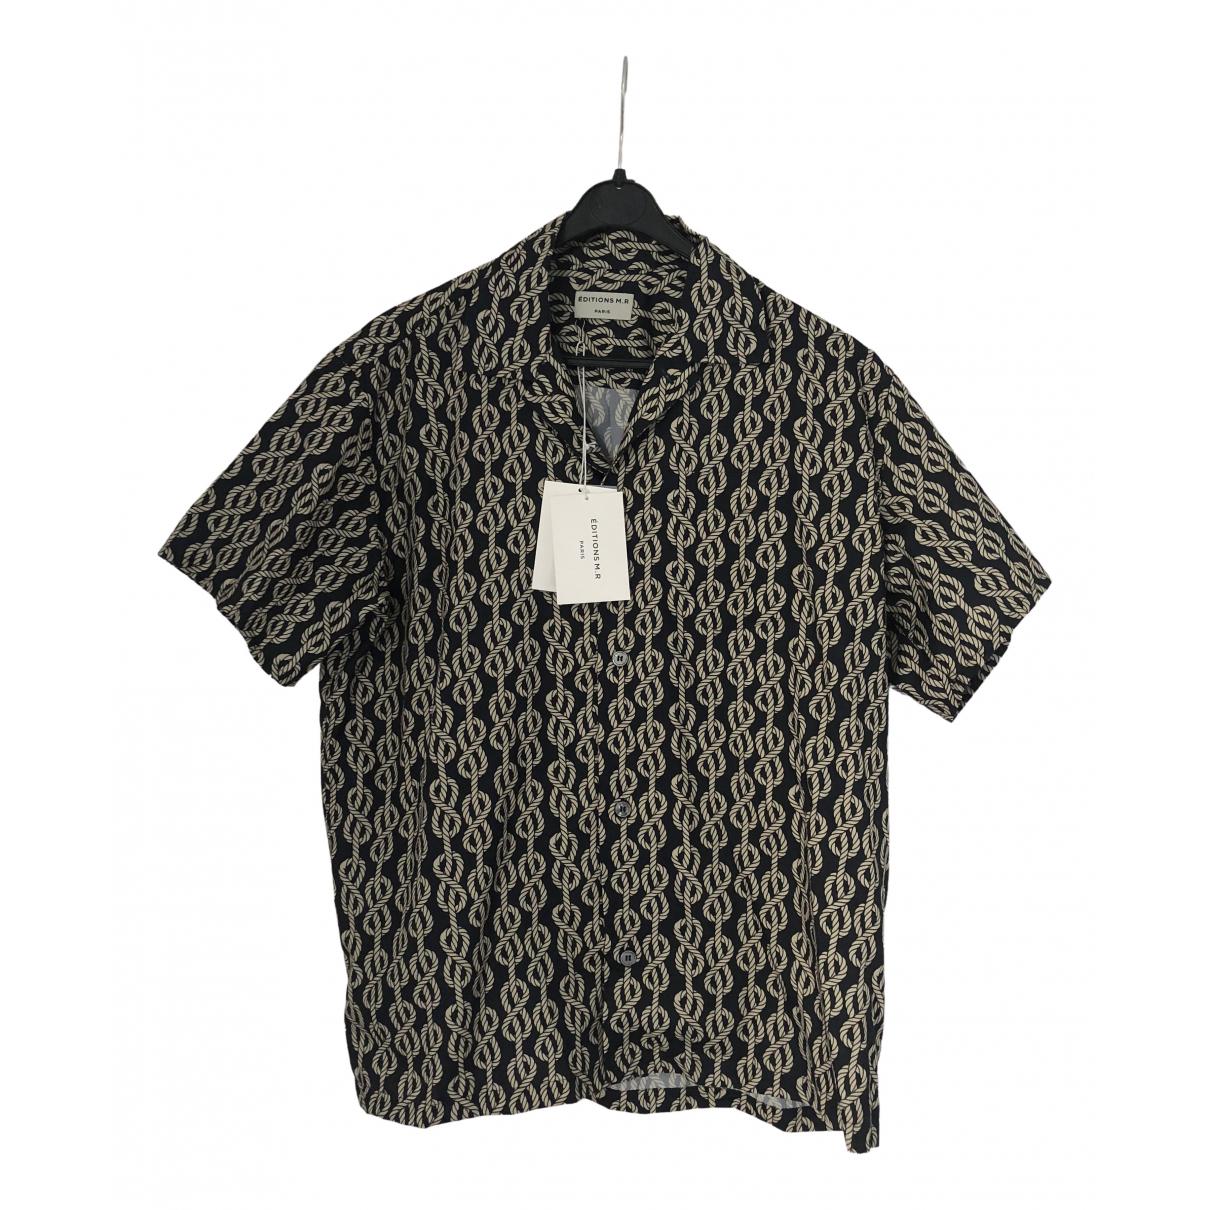 Editions M.r \N Grey Shirts for Men 38 EU (tour de cou / collar)